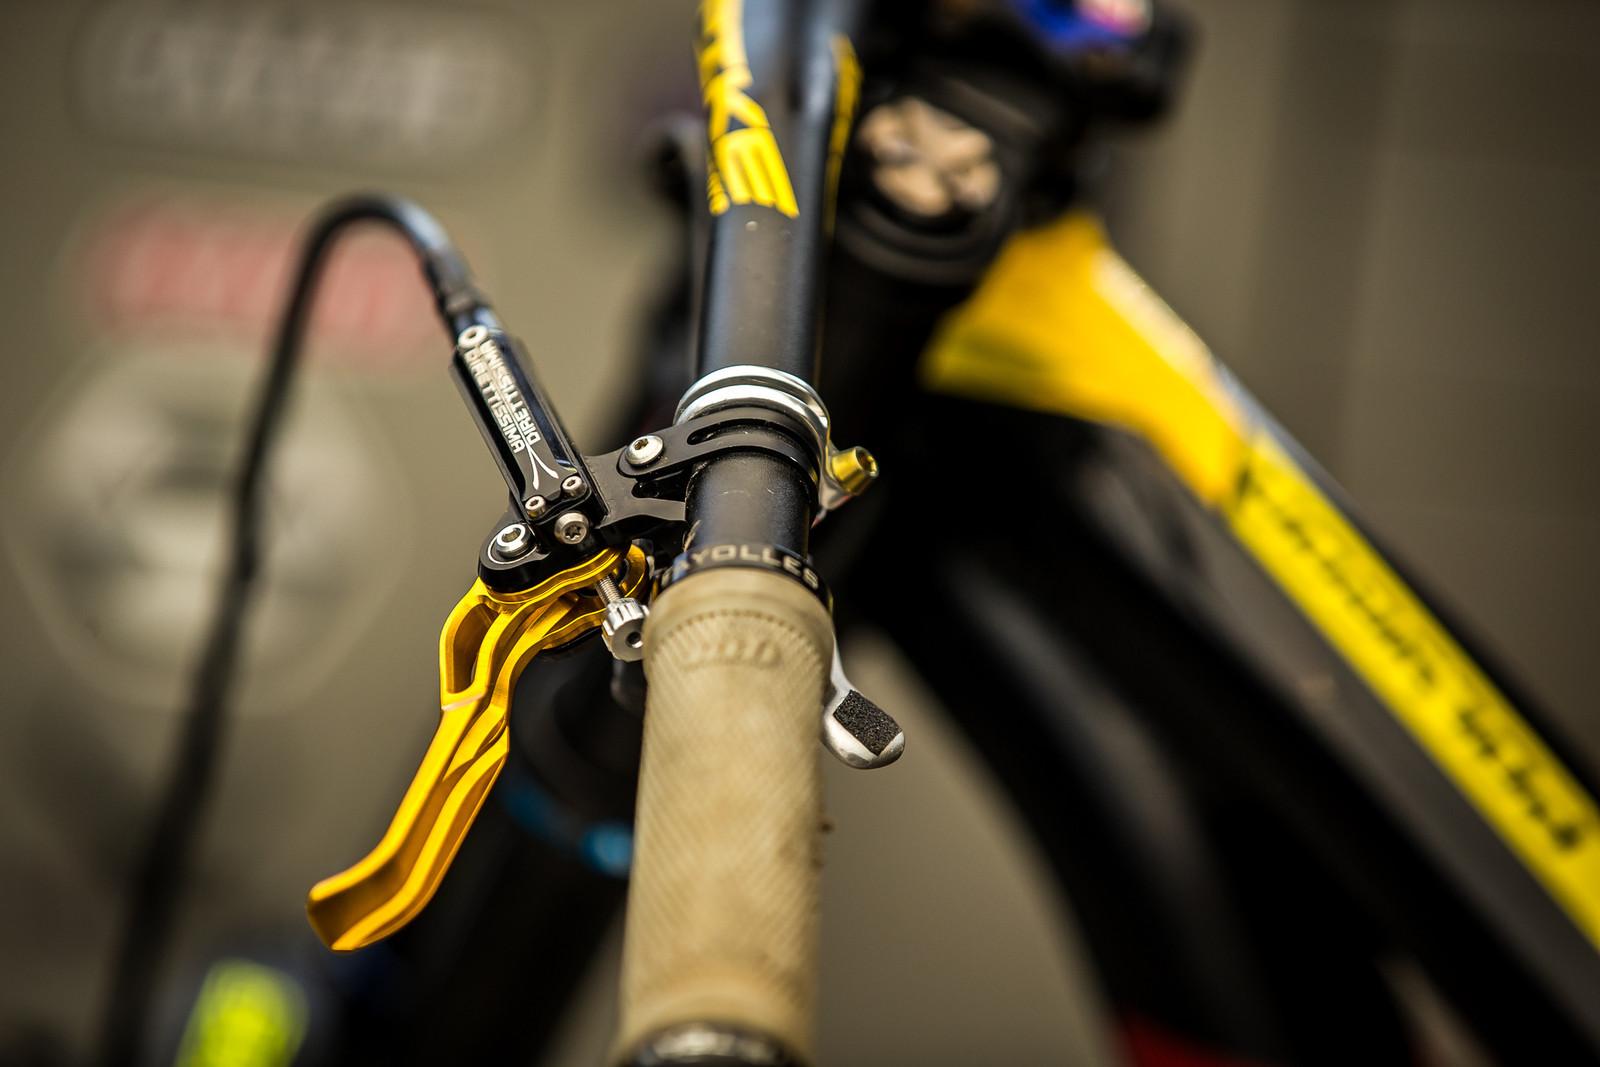 TrickStuff Brakes - 2017 Leogang World Cup Pit Bits - Mountain Biking Pictures - Vital MTB